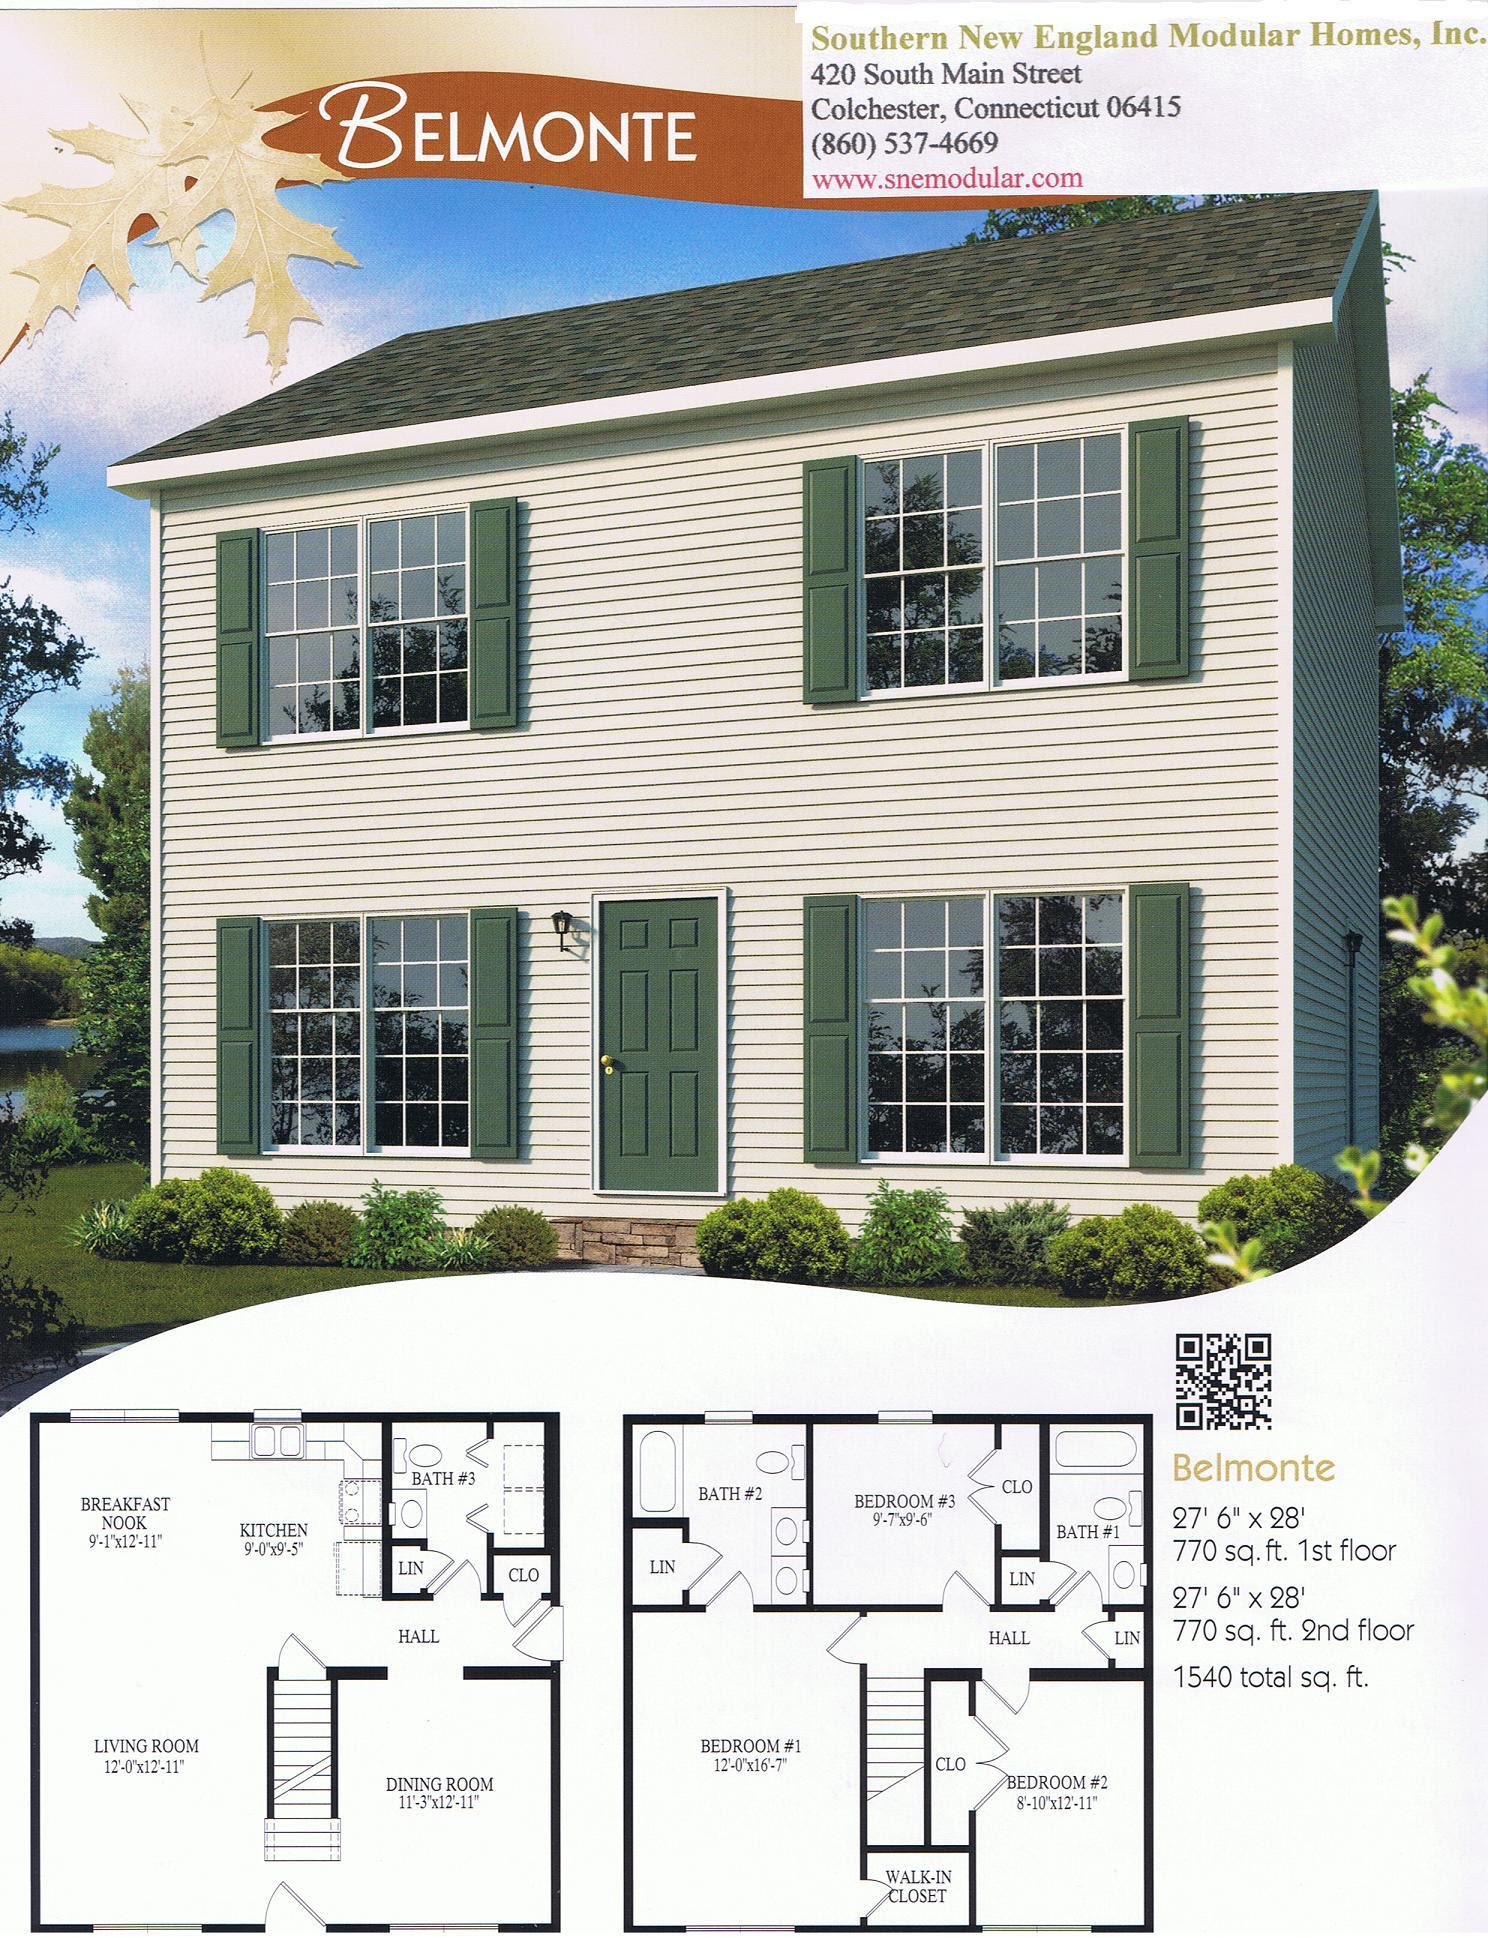 Modular Home Plans Home And Aplliances